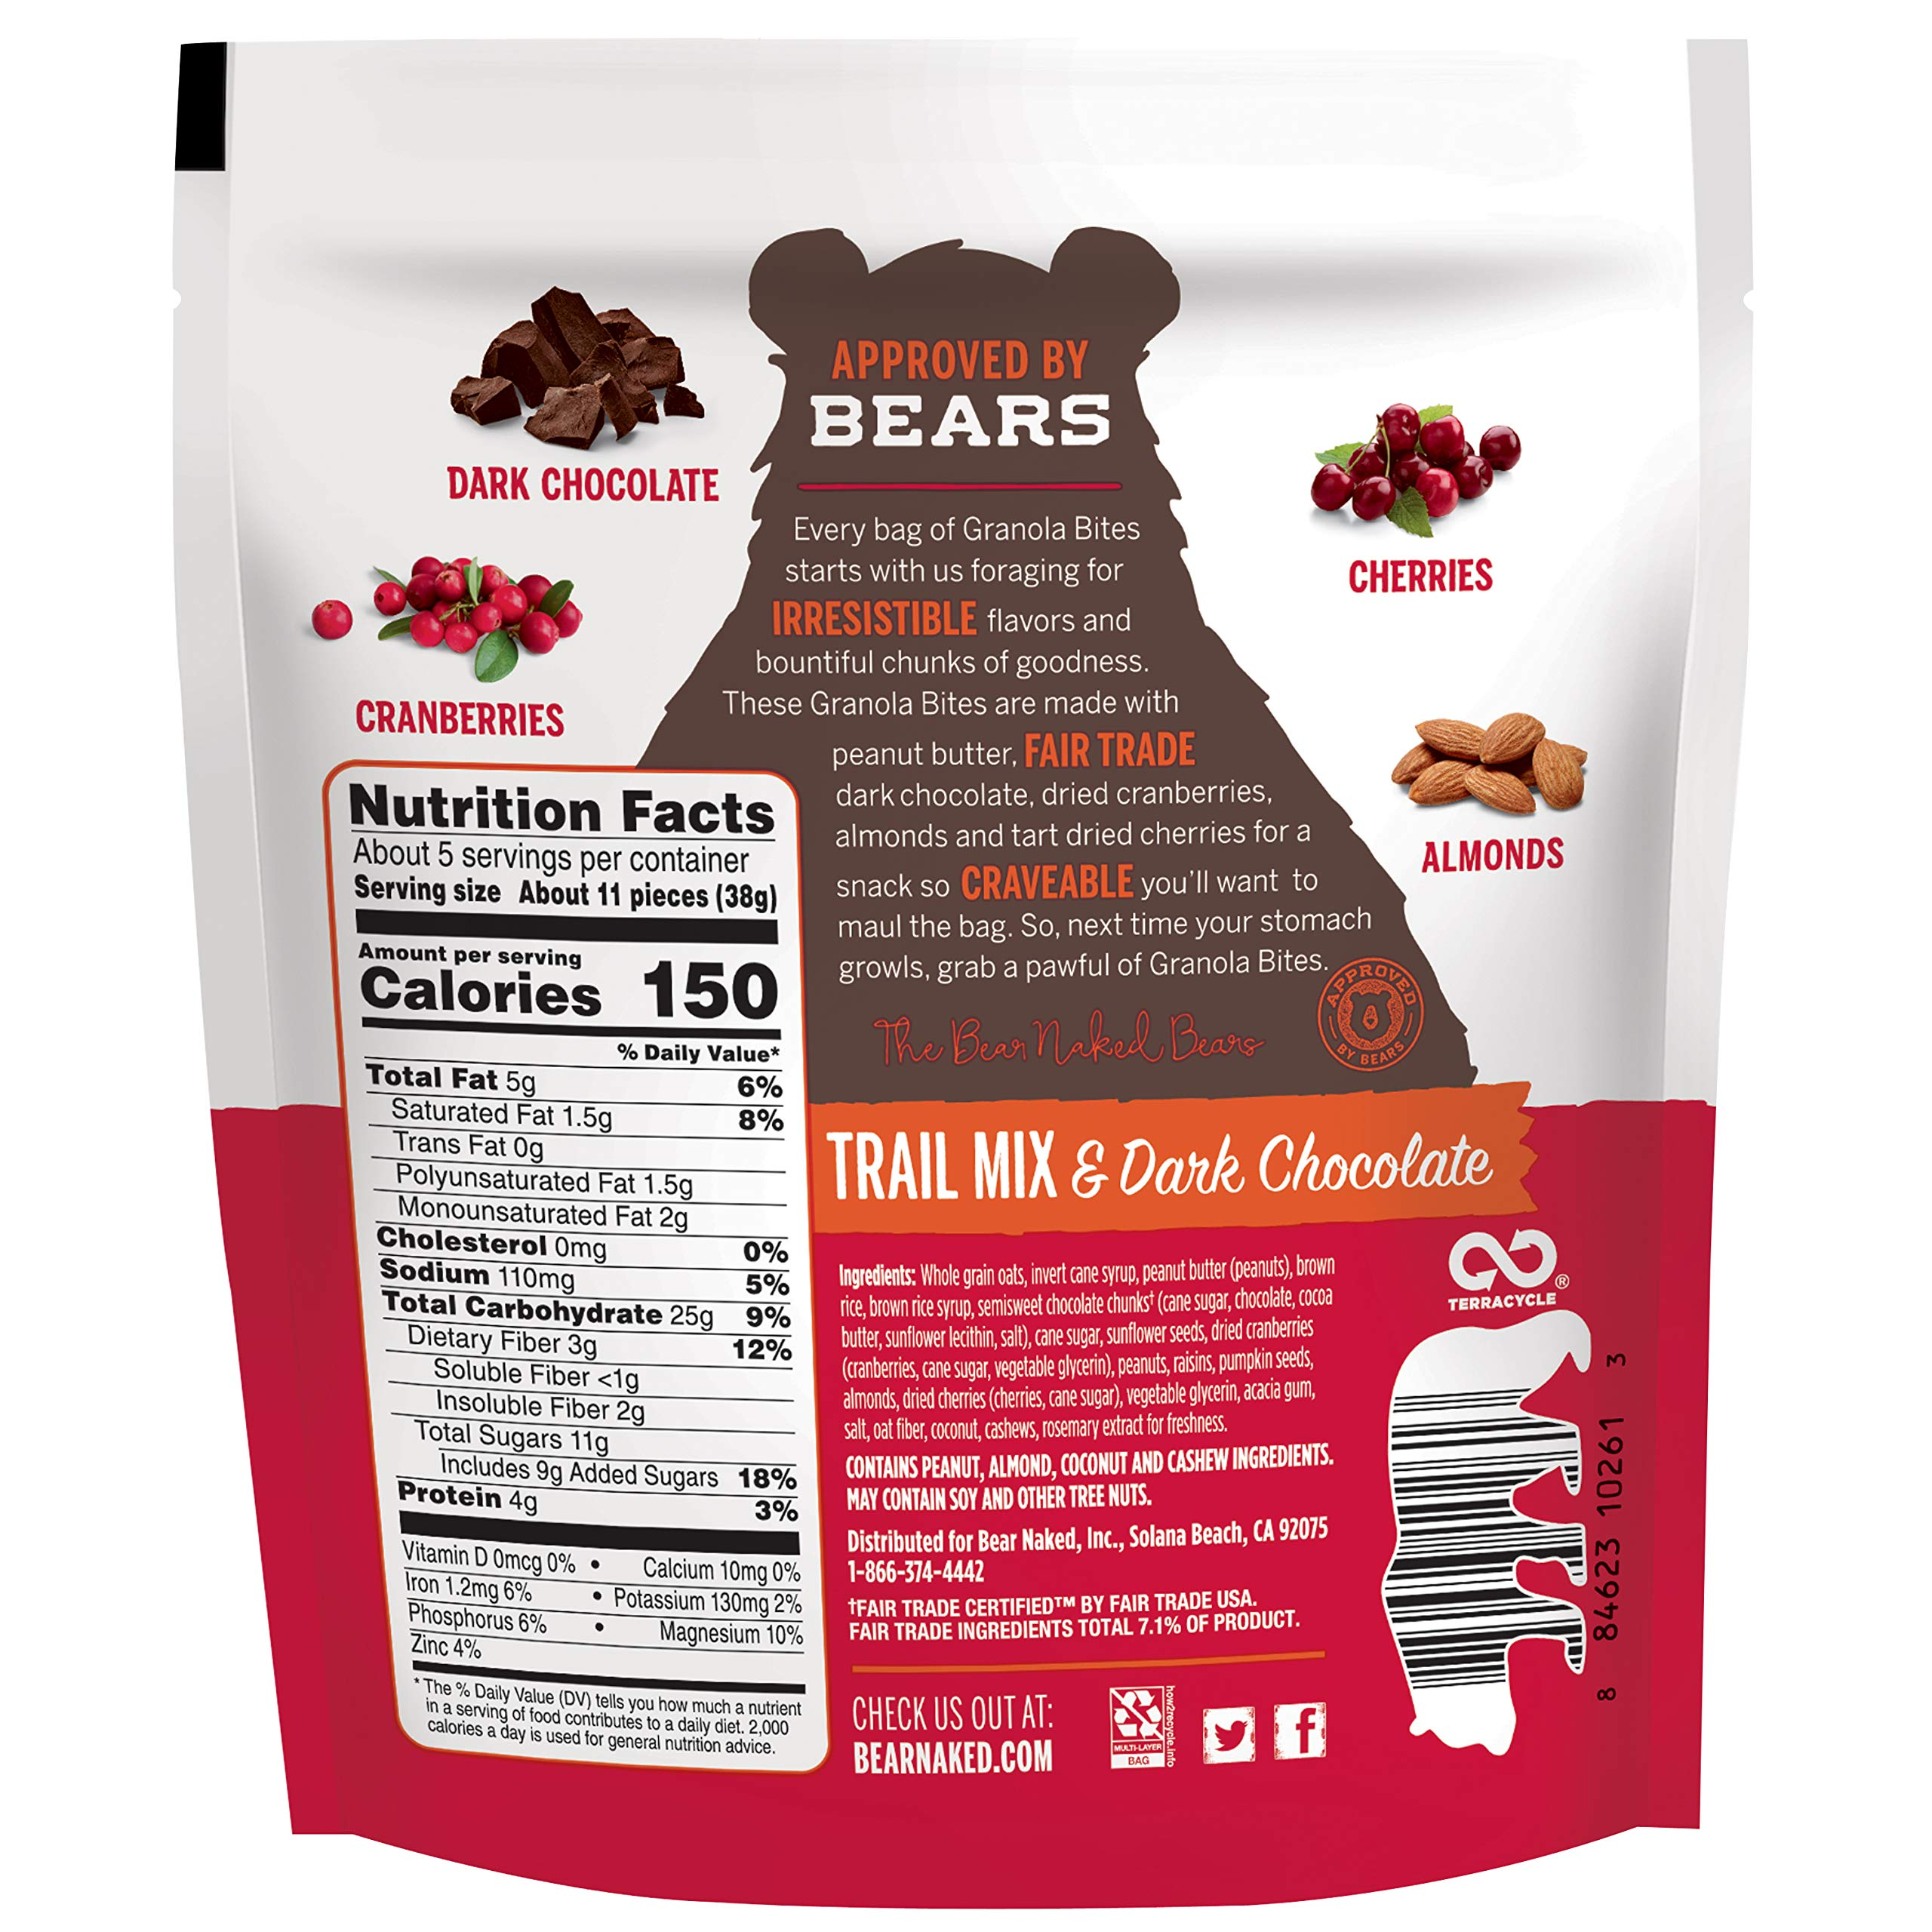 Bear Naked Trail Mix & Dark Chocolate Granola Bites - Gluten Free | Non-GMO | Kosher | Vegan - 7.2 Oz (6Count) by Bear Naked (Image #2)